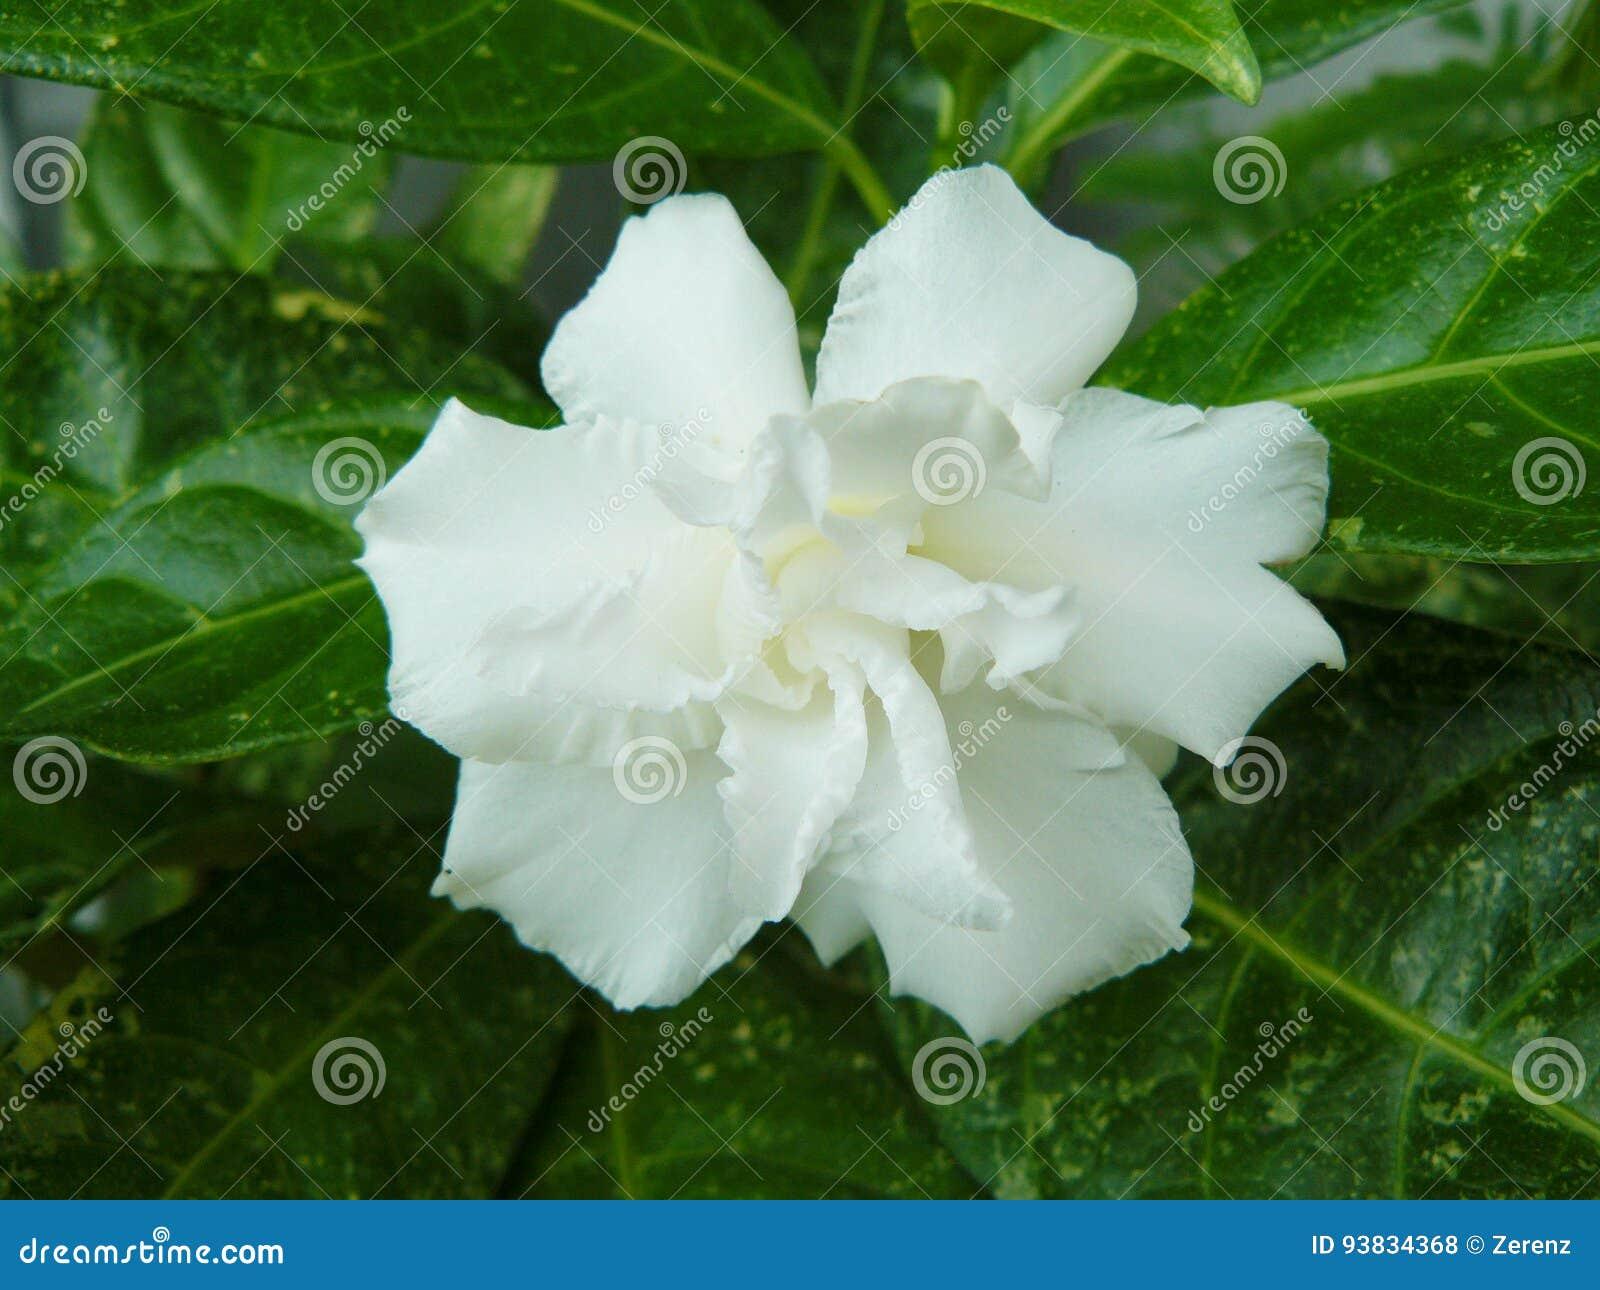 Cape jasmine or gardenia jasmine flower stock photo image of download cape jasmine or gardenia jasmine flower stock photo image of common delicate izmirmasajfo